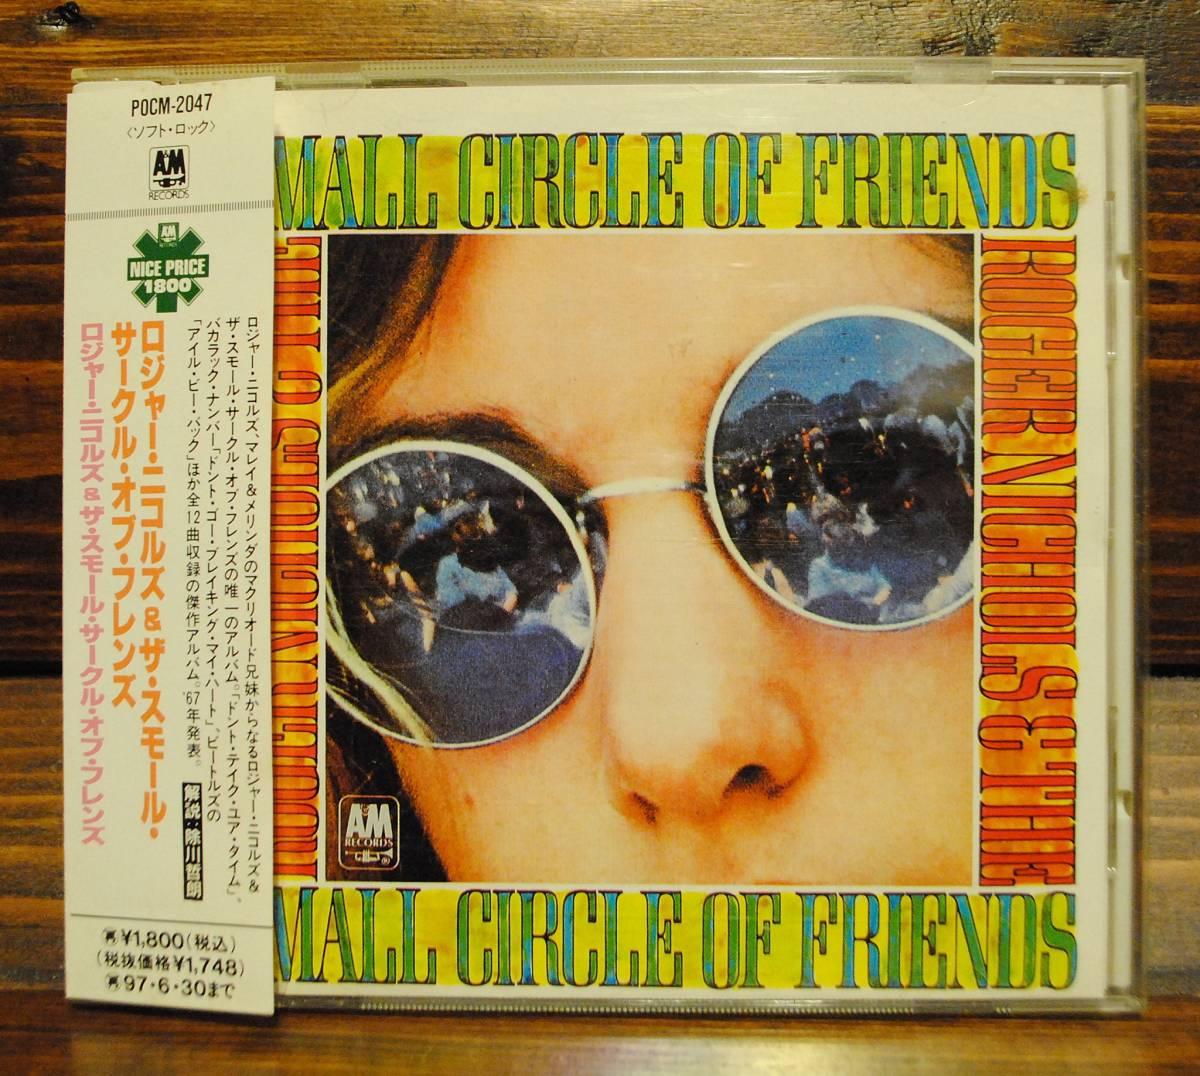 ●CD● Roger Nichols & The Small Circle Of Friends / 1995年 国内盤 / 1967年作品 / 大名盤 / 小西康陽ネタ / 送料_画像1